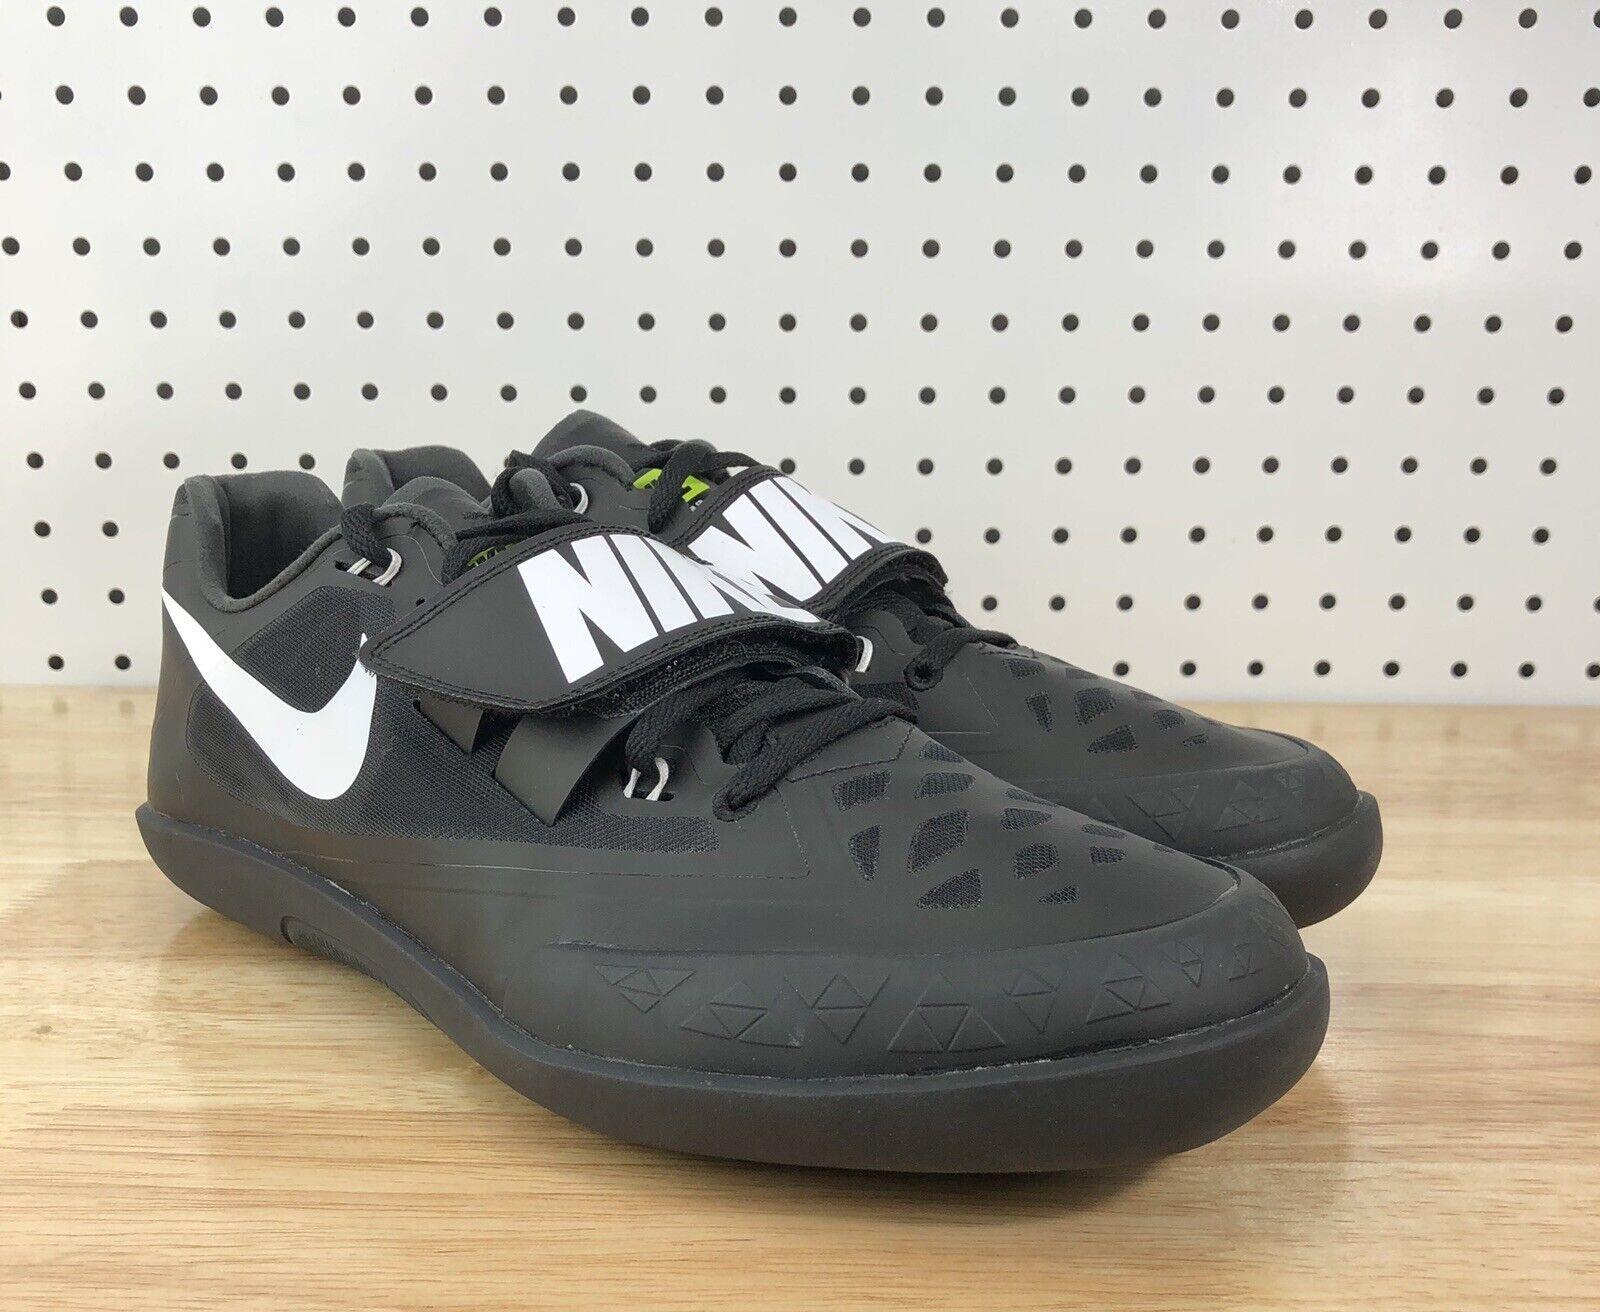 Tamaño 14 NIKE Zoom Rival SD 4 Discus tiro Lanzar zapatos Negro 685135 017 Put